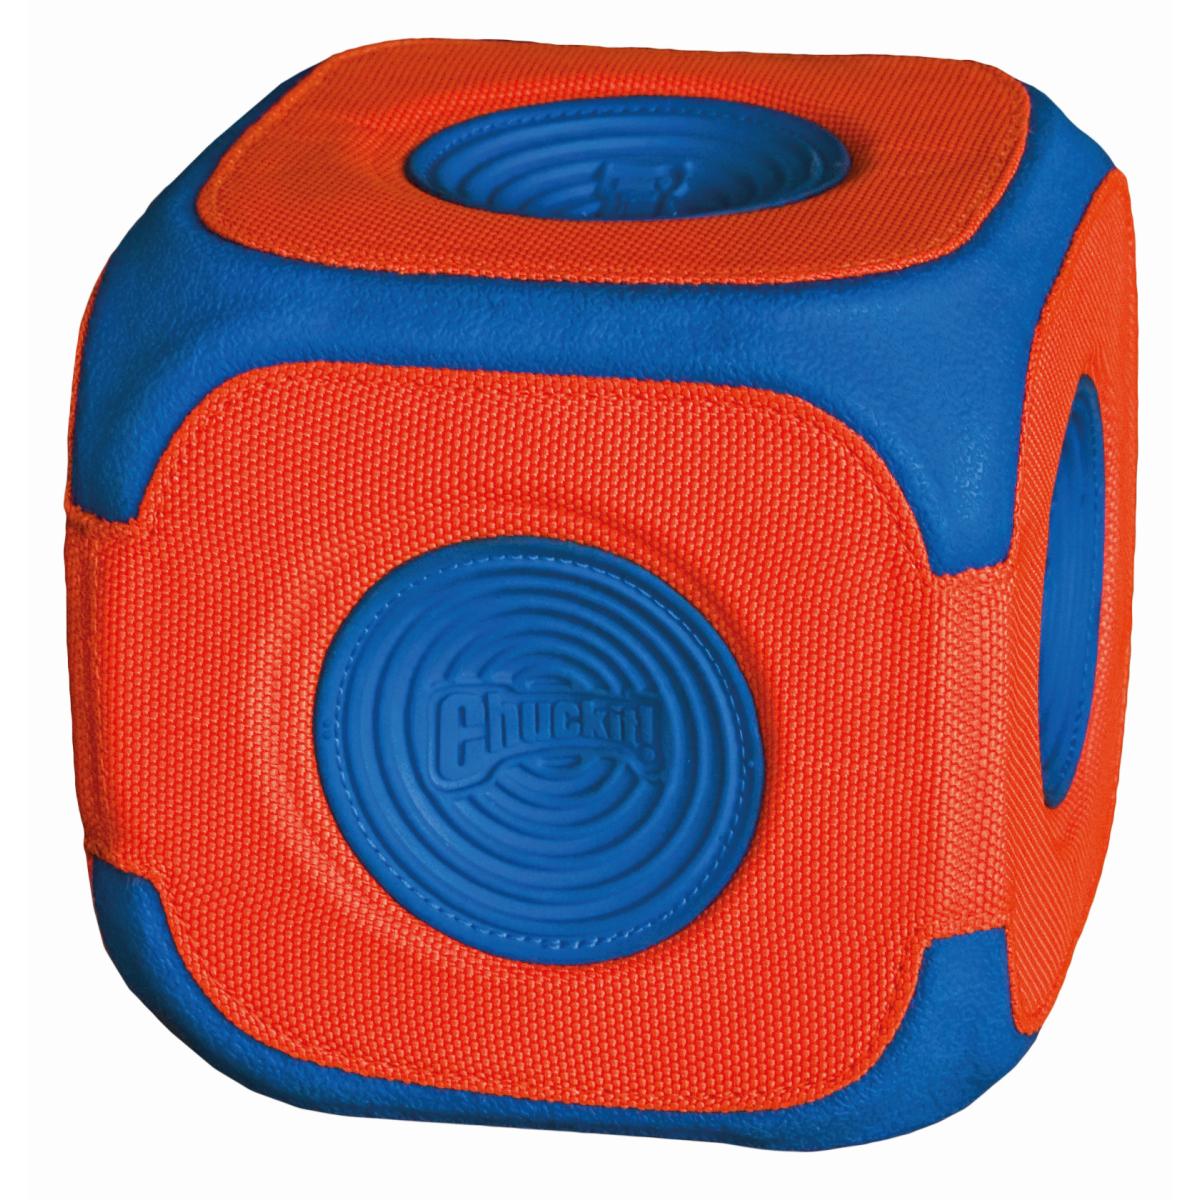 Kick cube oranje/blauw